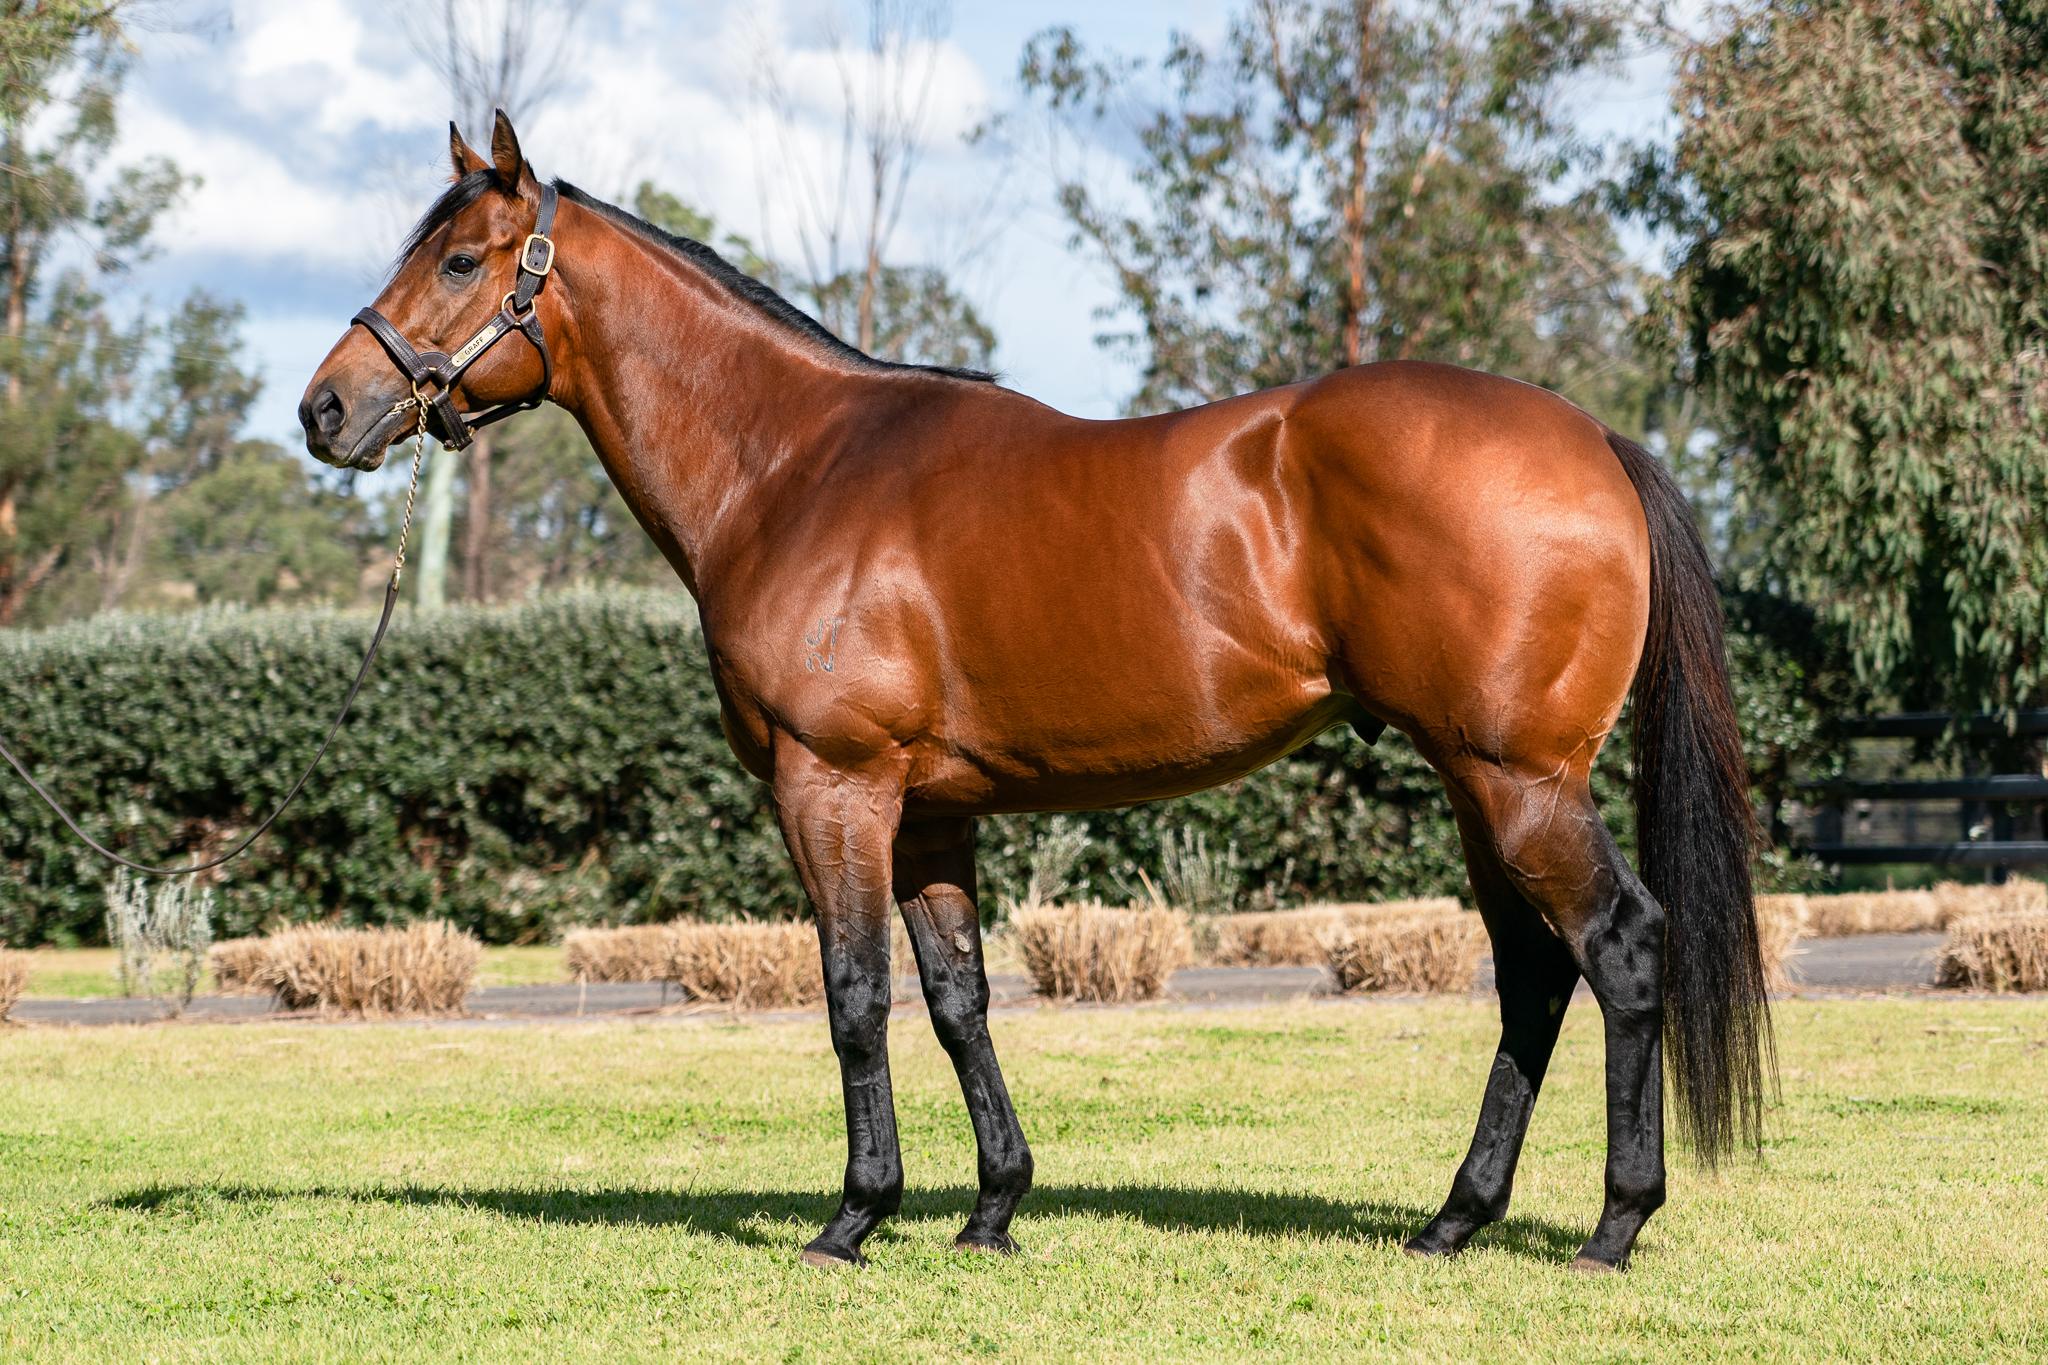 https://www.stallions.com.au/wp-content/uploads/2021/08/Graff-Conformation-1.jpg